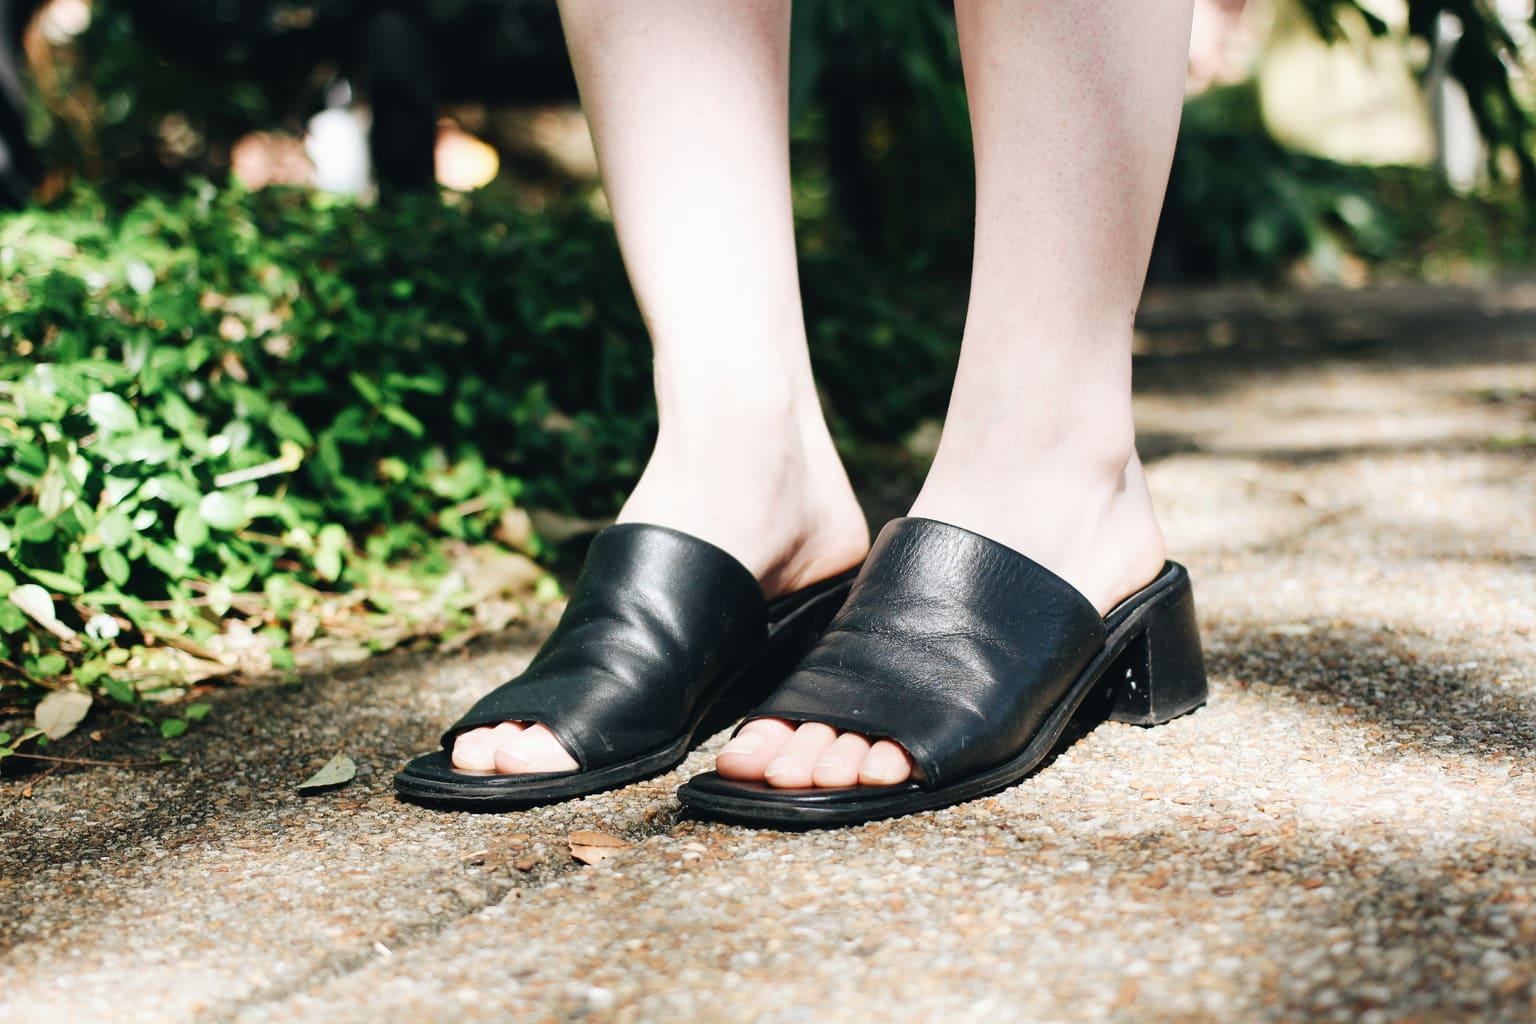 Chunky-heeled black slide-on vintage sandals.